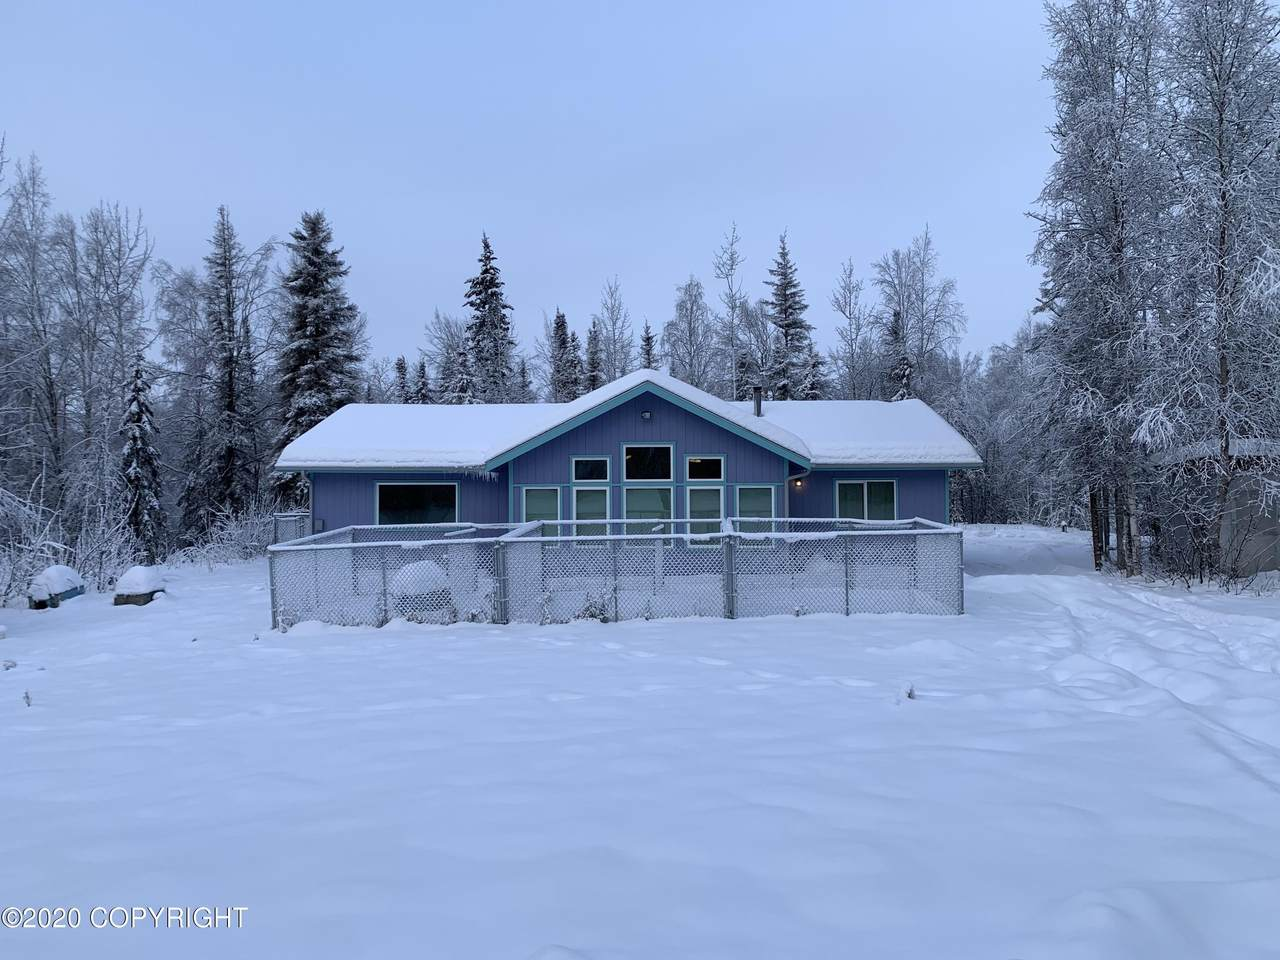 https://bt-photos.global.ssl.fastly.net/alaska/1280_boomver_5_20-15148-2.jpg